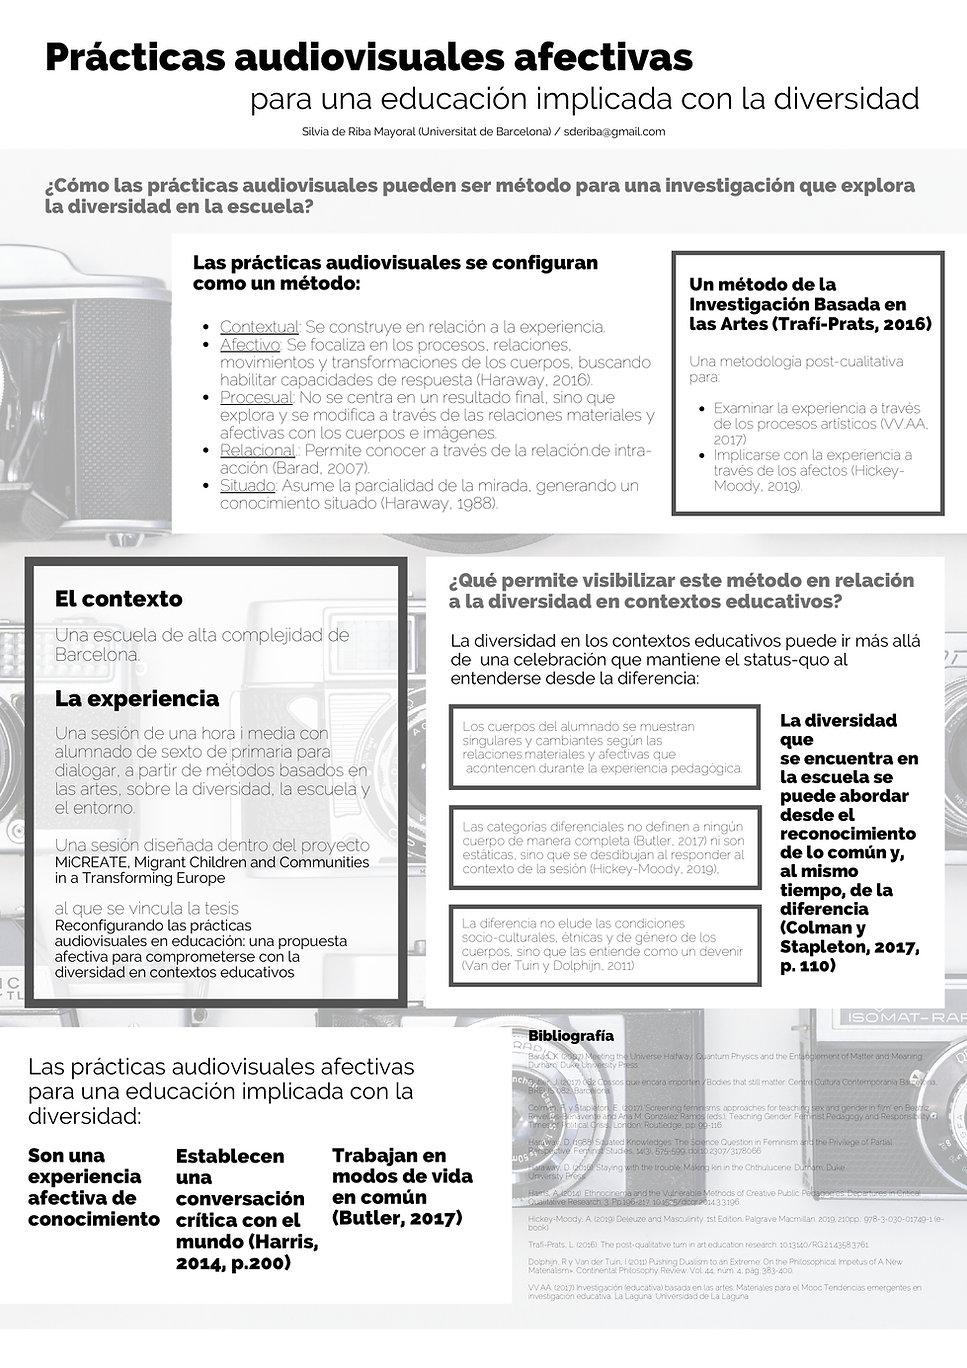 2006_civartes_sderiba_poster - Silvia de